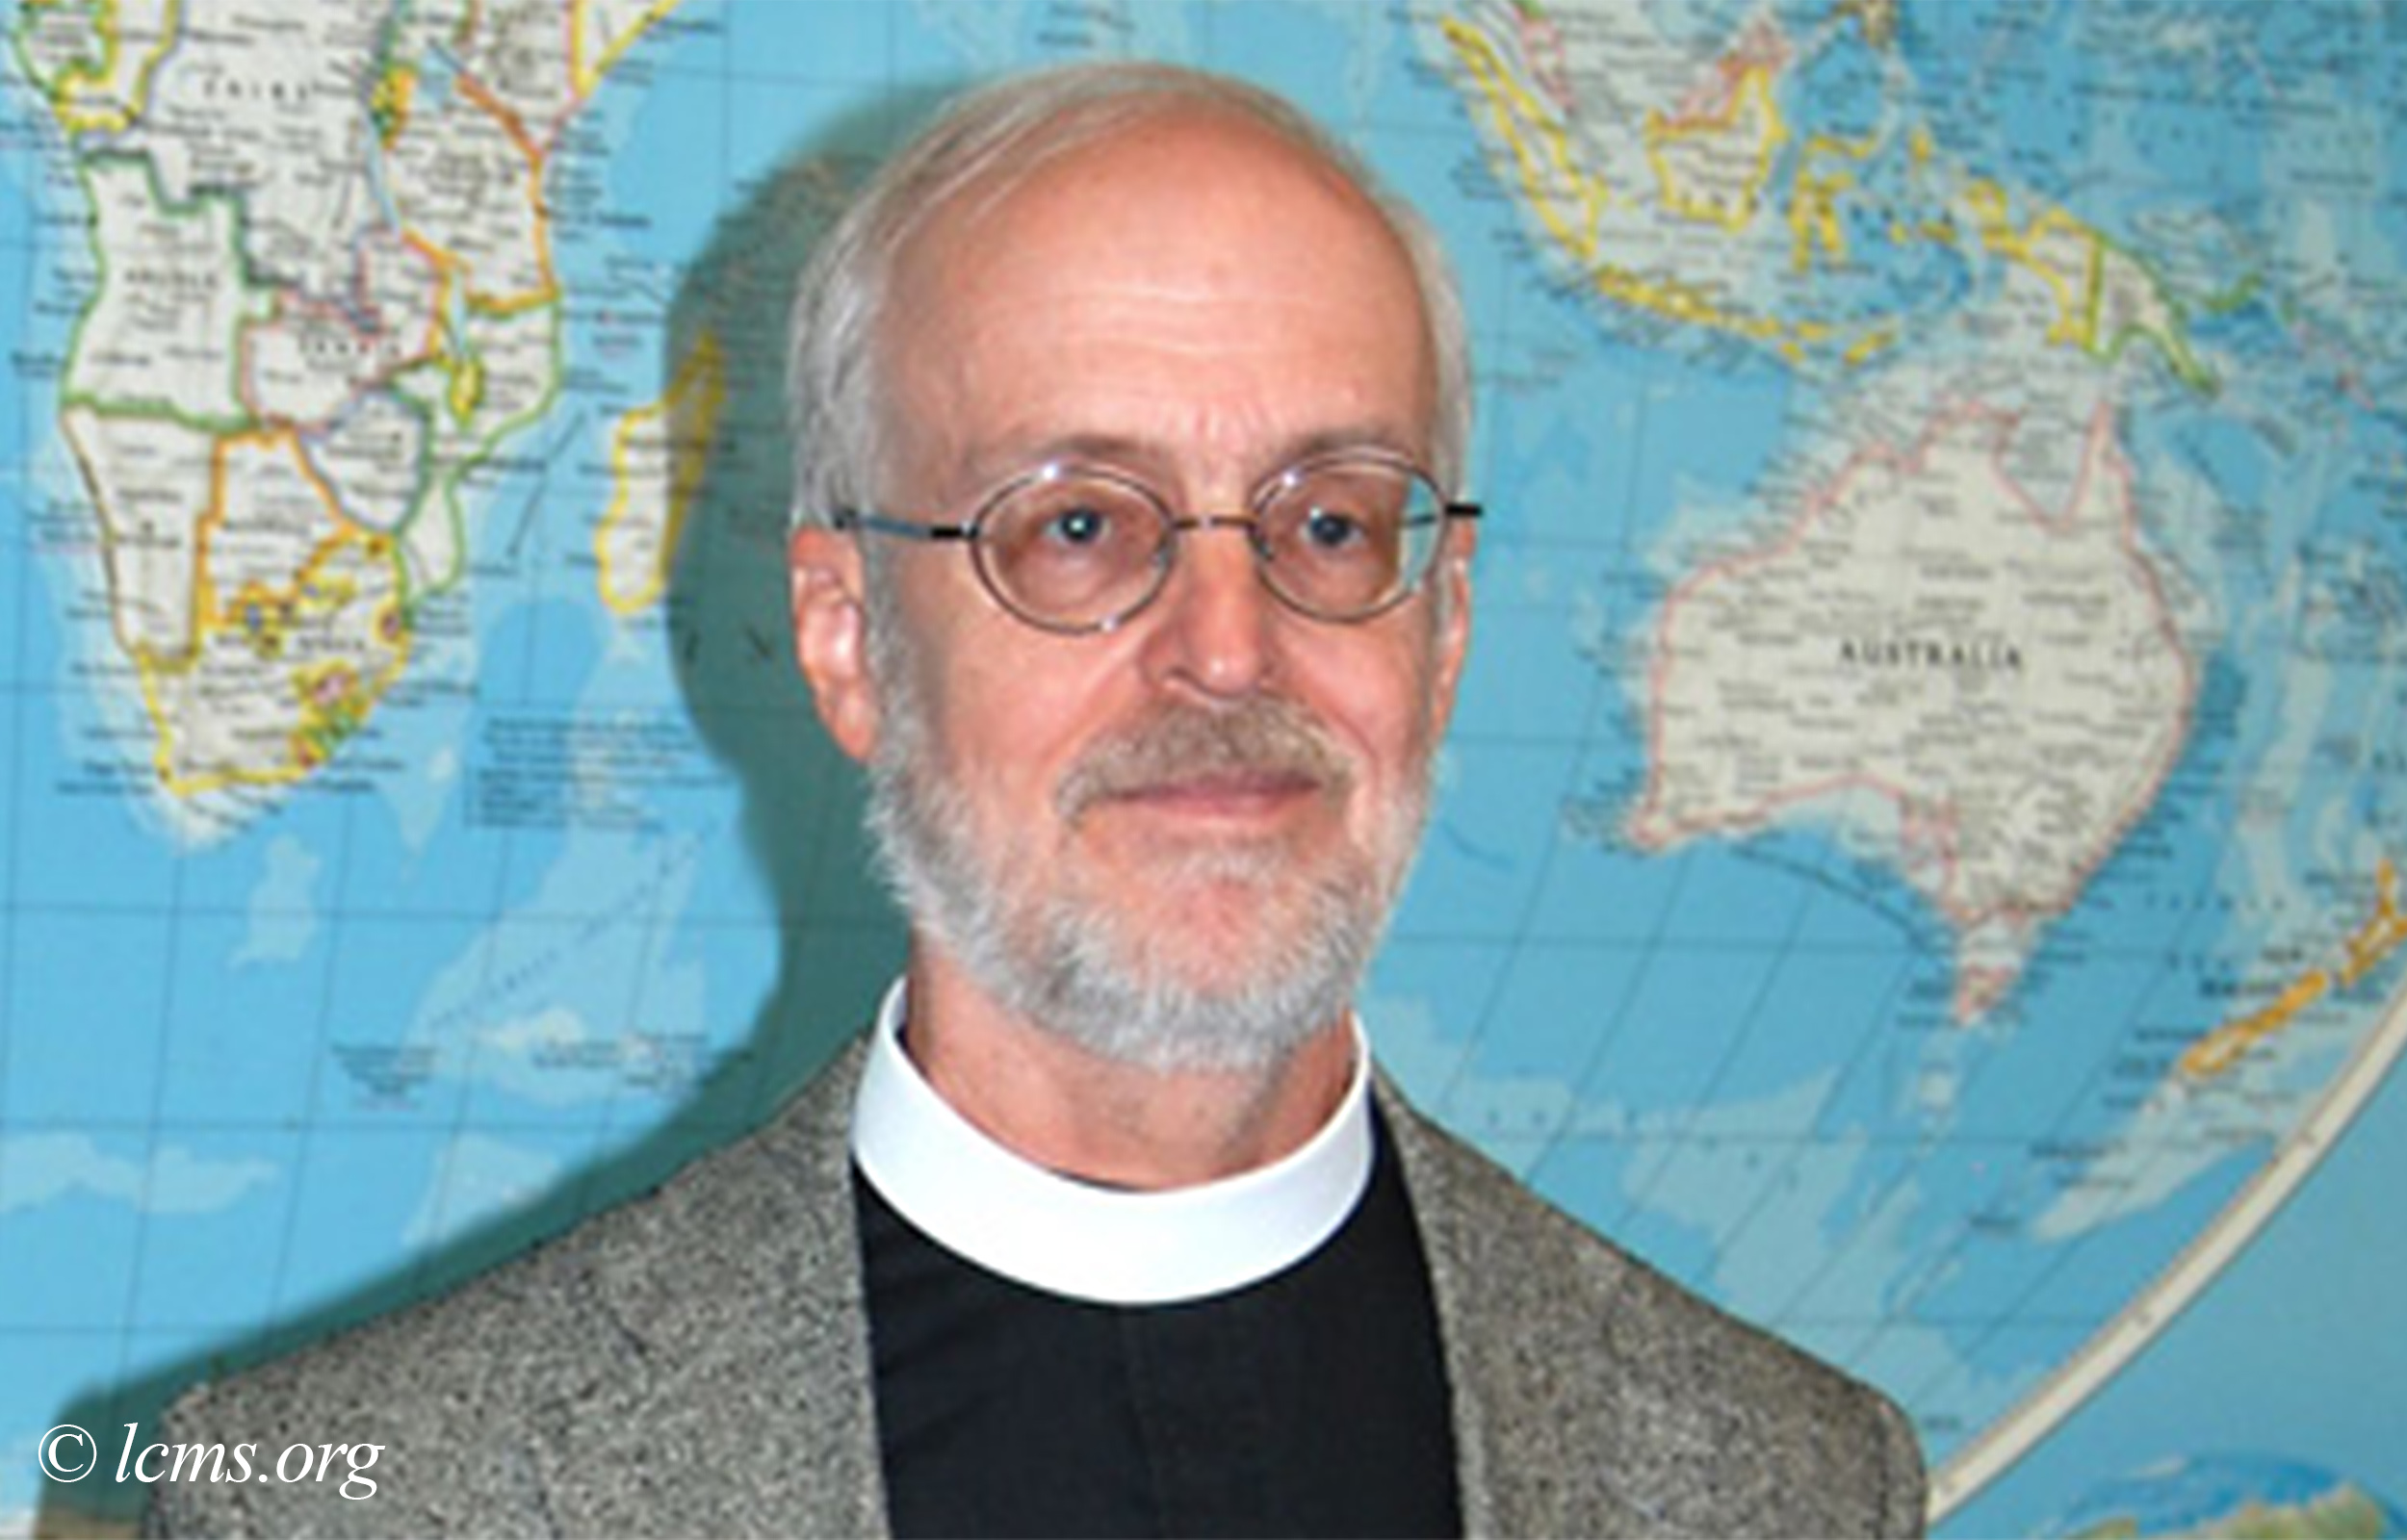 Rev. Alan Ludwig, missionary to Siberia